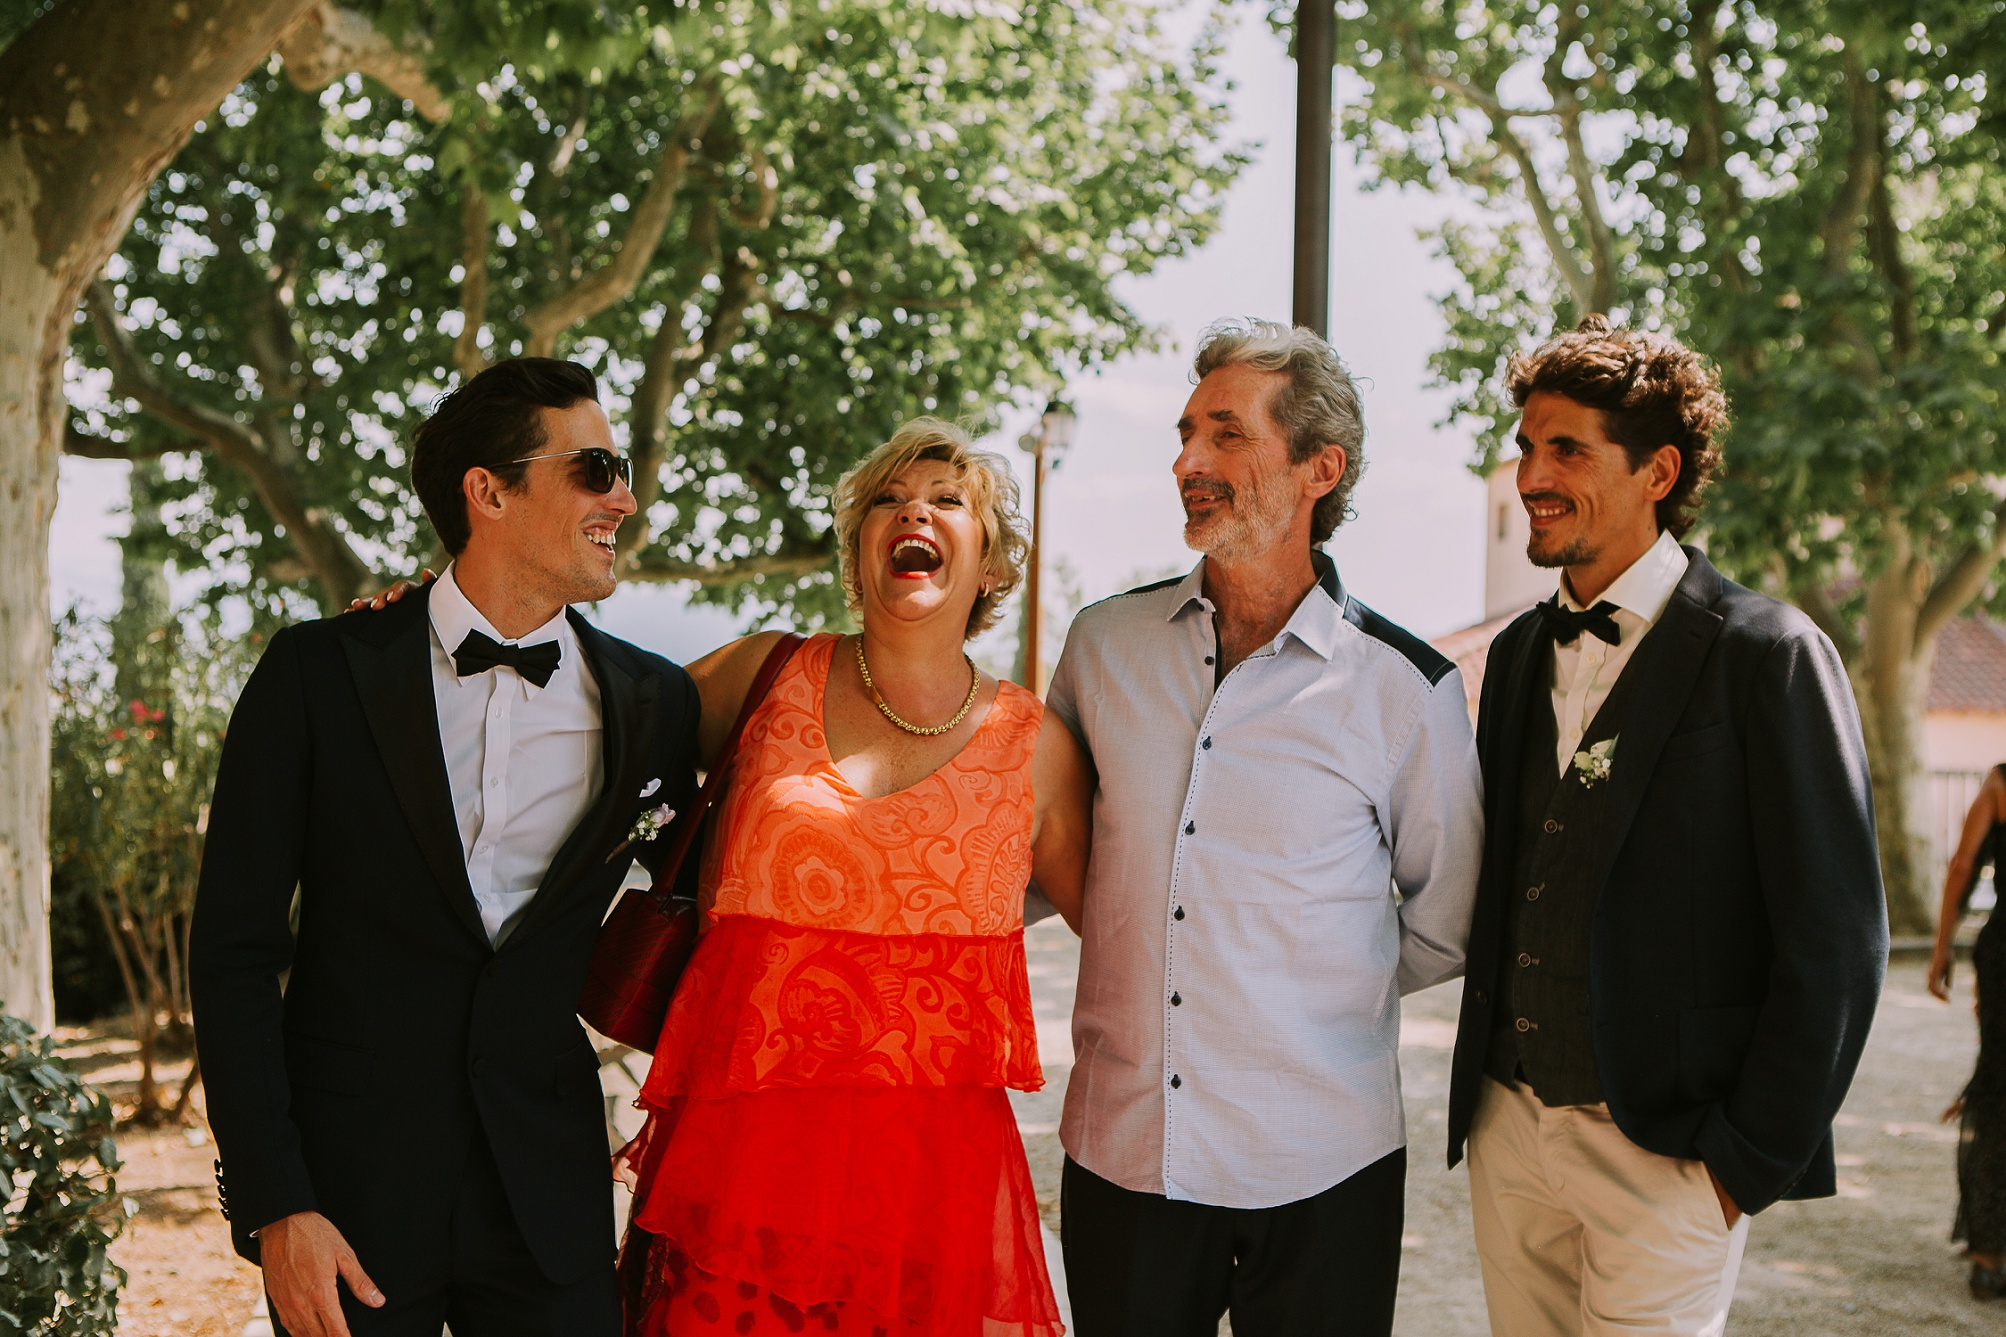 katerynaphotos-mariage-photographe-puyloubier-provence-aix-en-provence-sud-de-la-france_0353.jpg